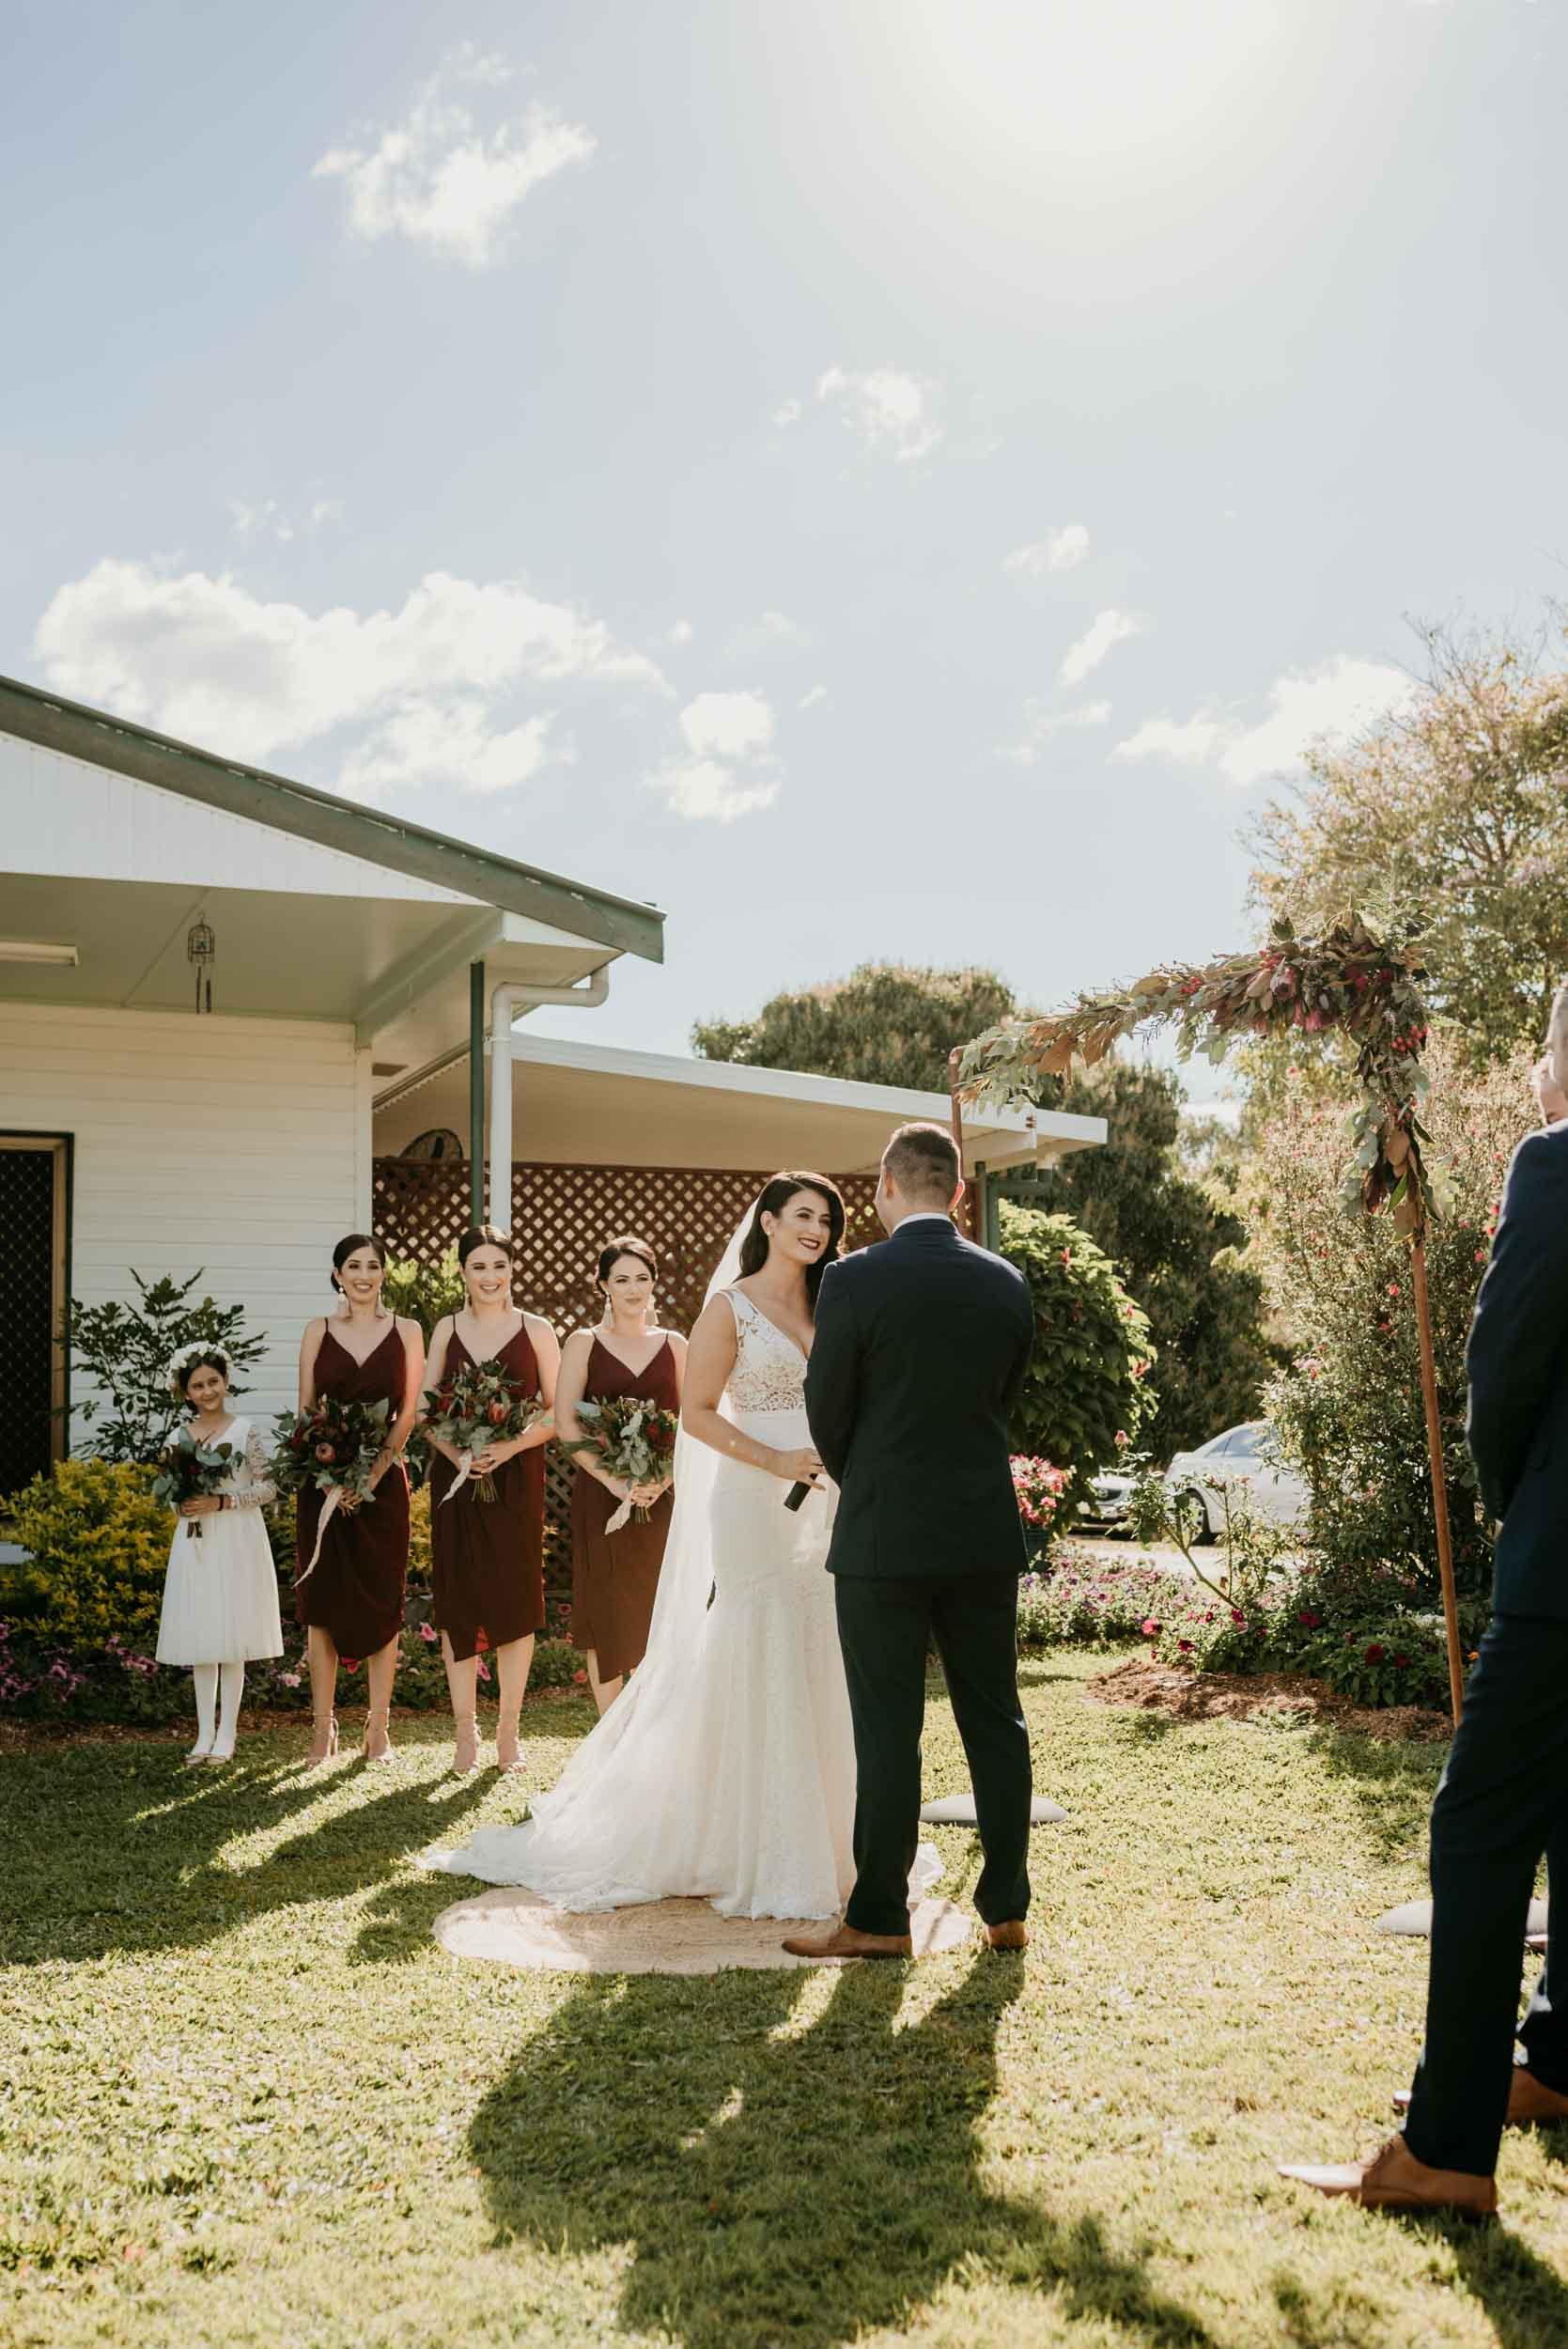 The Raw Photographer - Cairns Wedding Photographer - Atherton Tablelands - Mareeba farm Wedding - Irene Costa's Devine Bridal - Candid - Photo Package-25.jpg